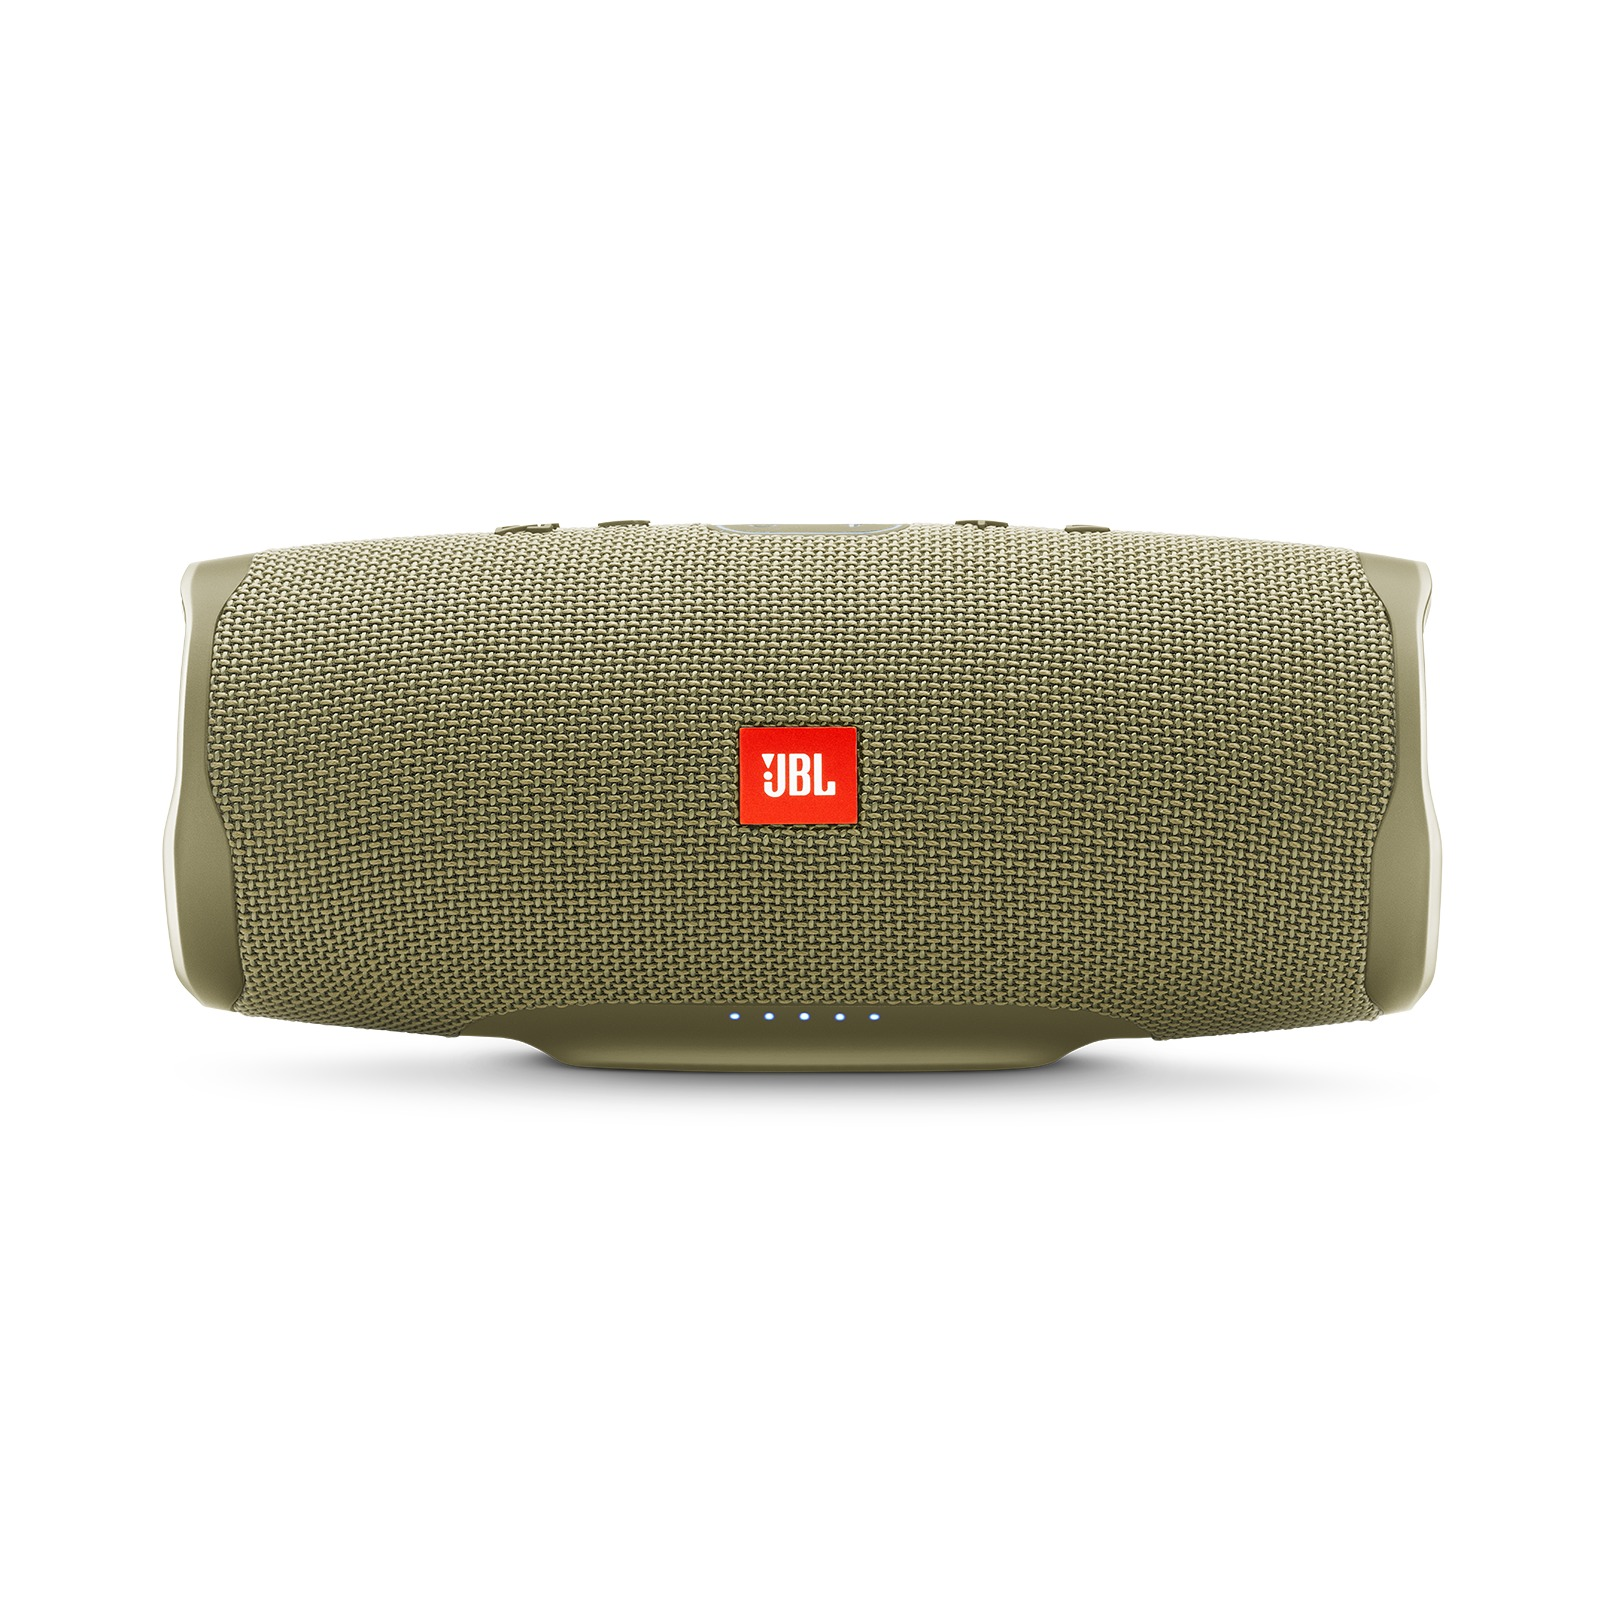 Korting JBL Charge 4 bluetooth speaker